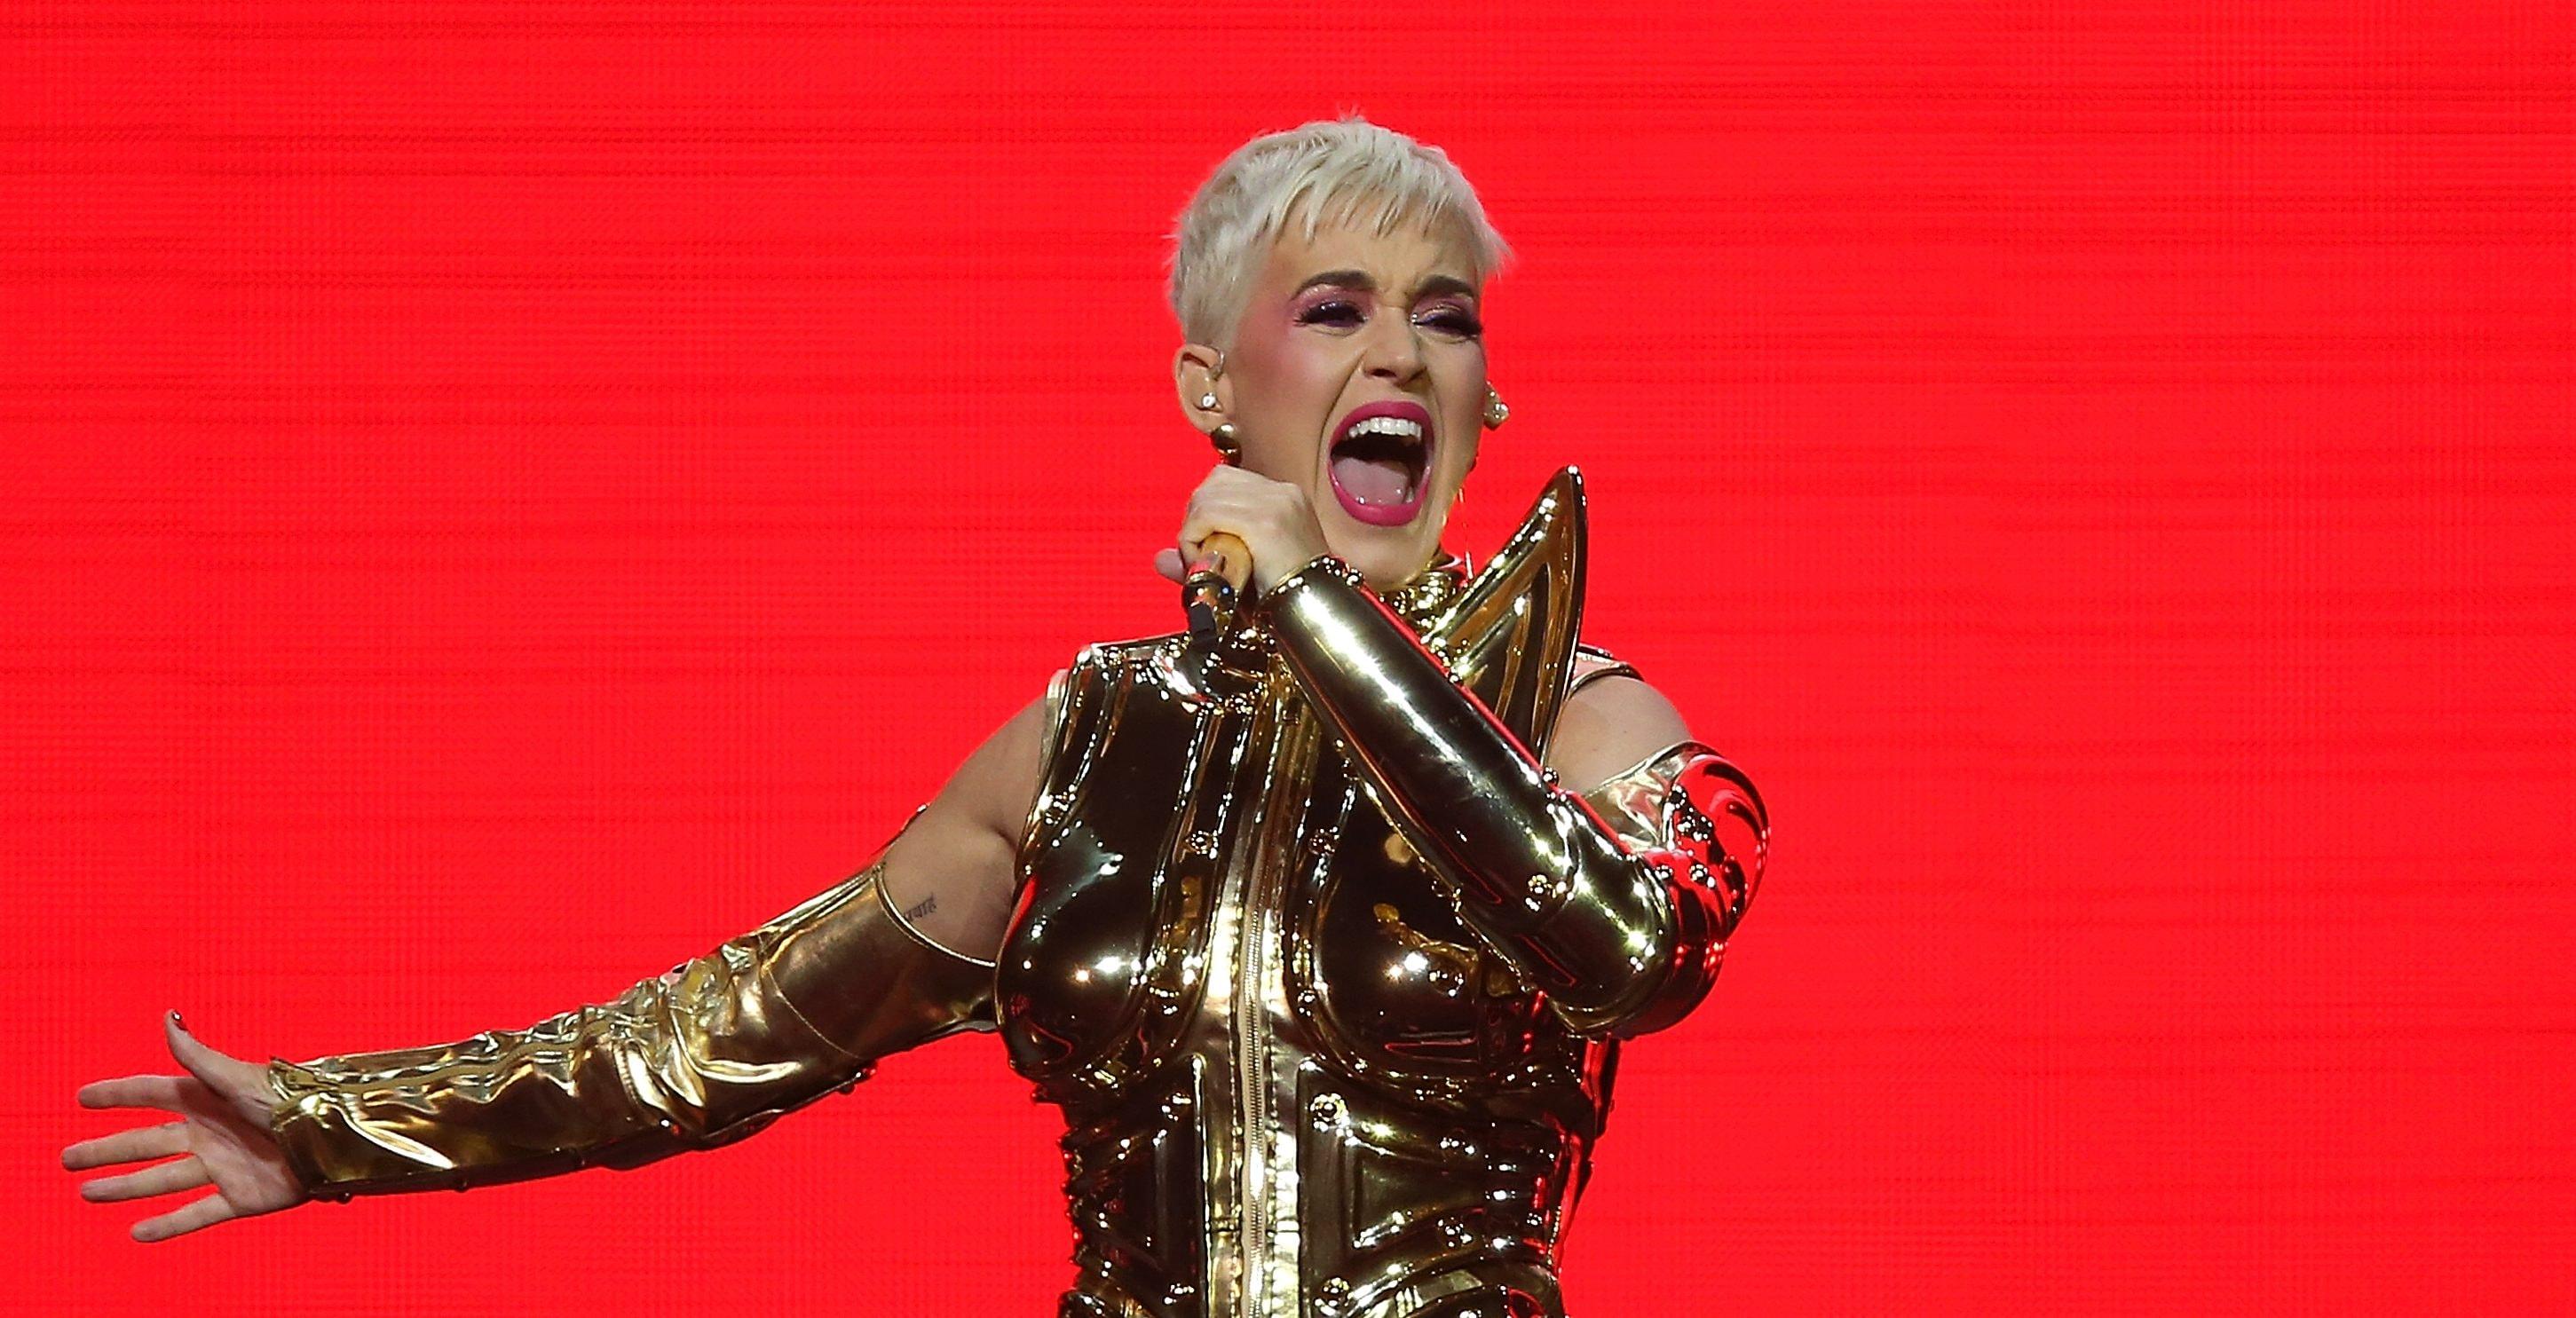 Katy Perry Perth Tour 2018 The Emoji Tiket Witness My Kiss Radio 93 5